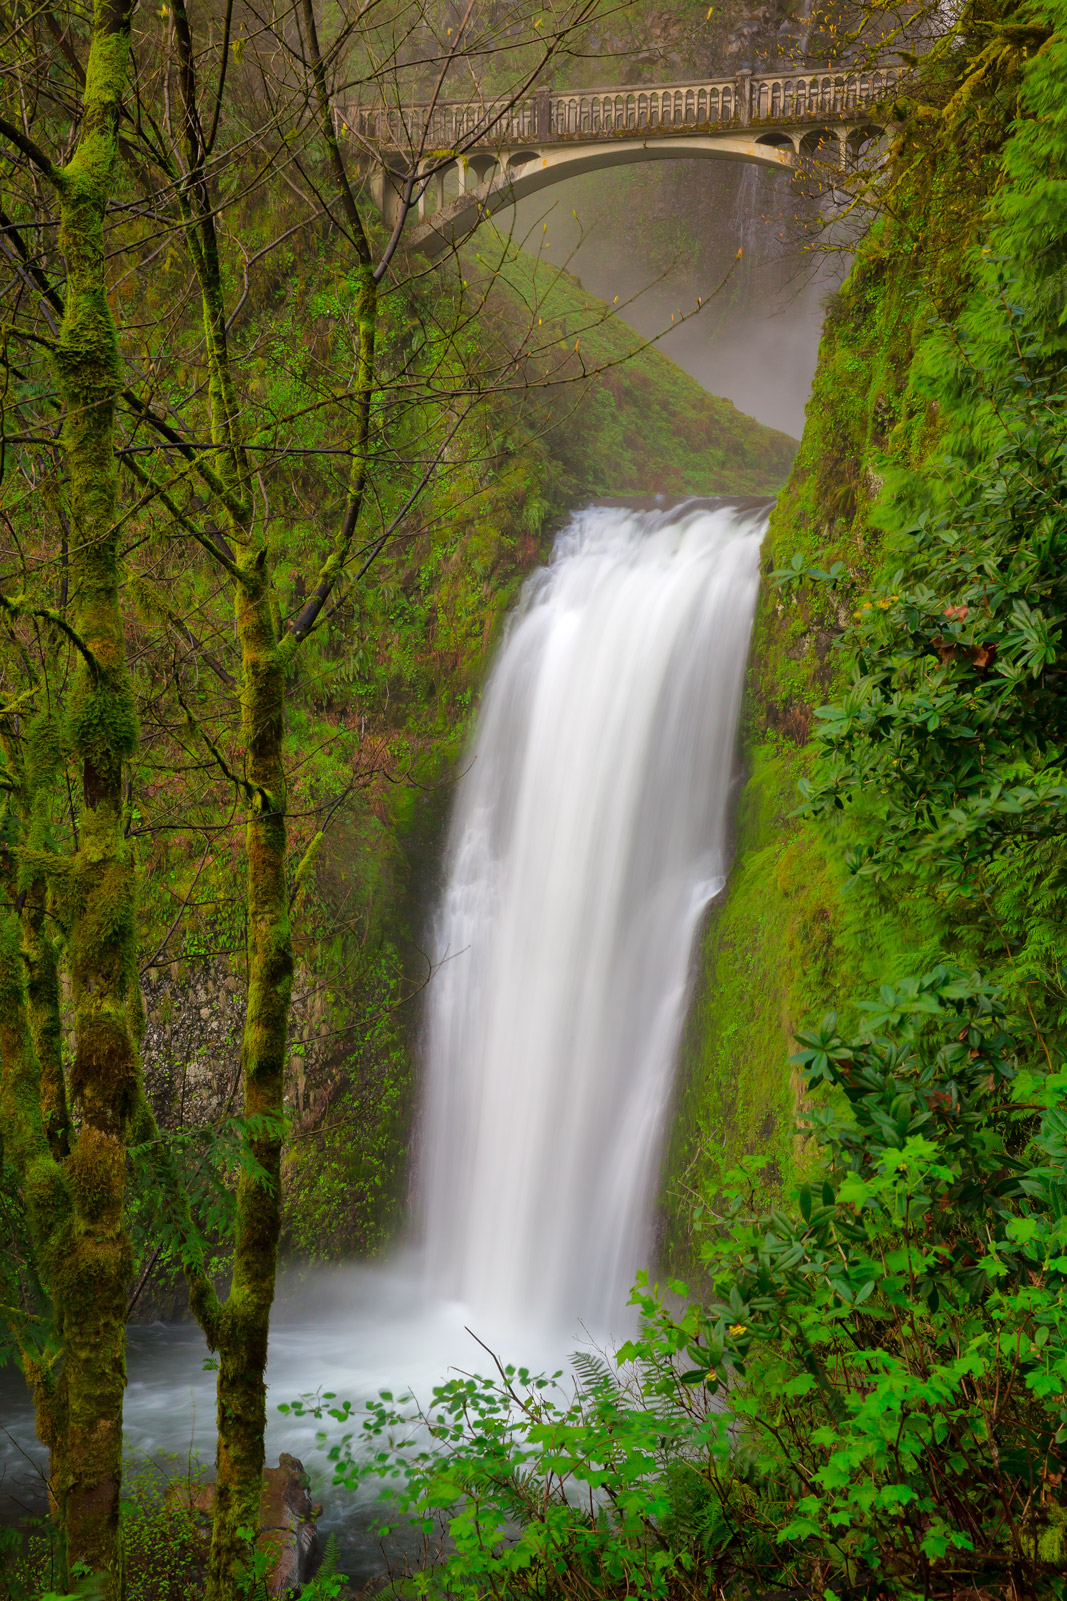 Oregon, Columbia River, Gorge, Multnomah, Falls, Waterfall, limited edition, photograph, fine art, landscape, photo